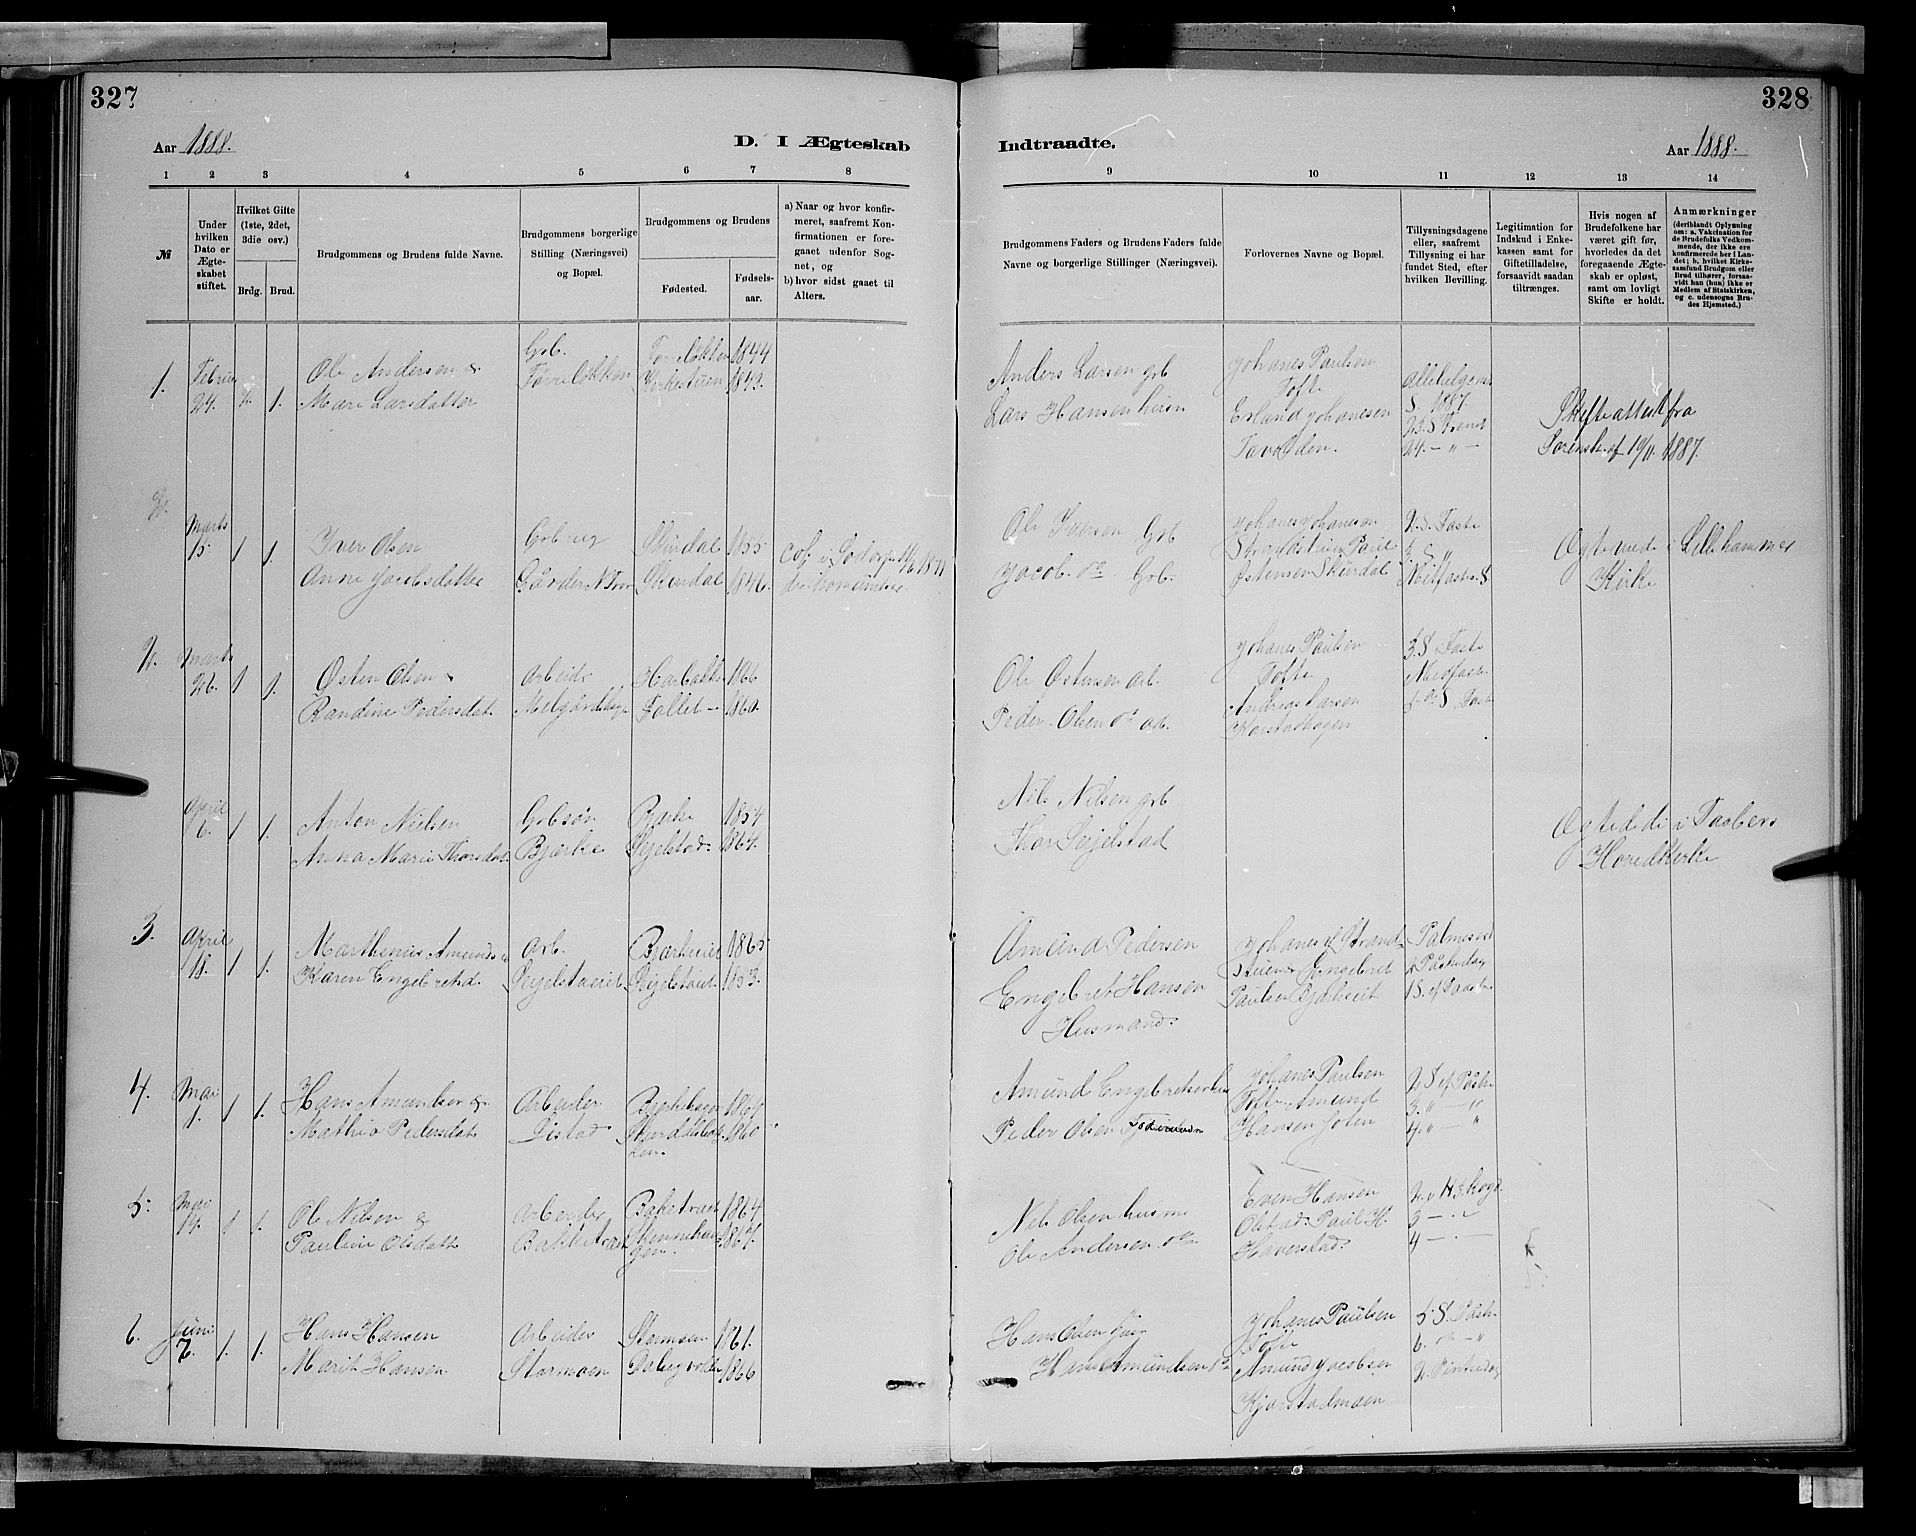 SAH, Sør-Fron prestekontor, H/Ha/Hab/L0003: Klokkerbok nr. 3, 1884-1896, s. 327-328